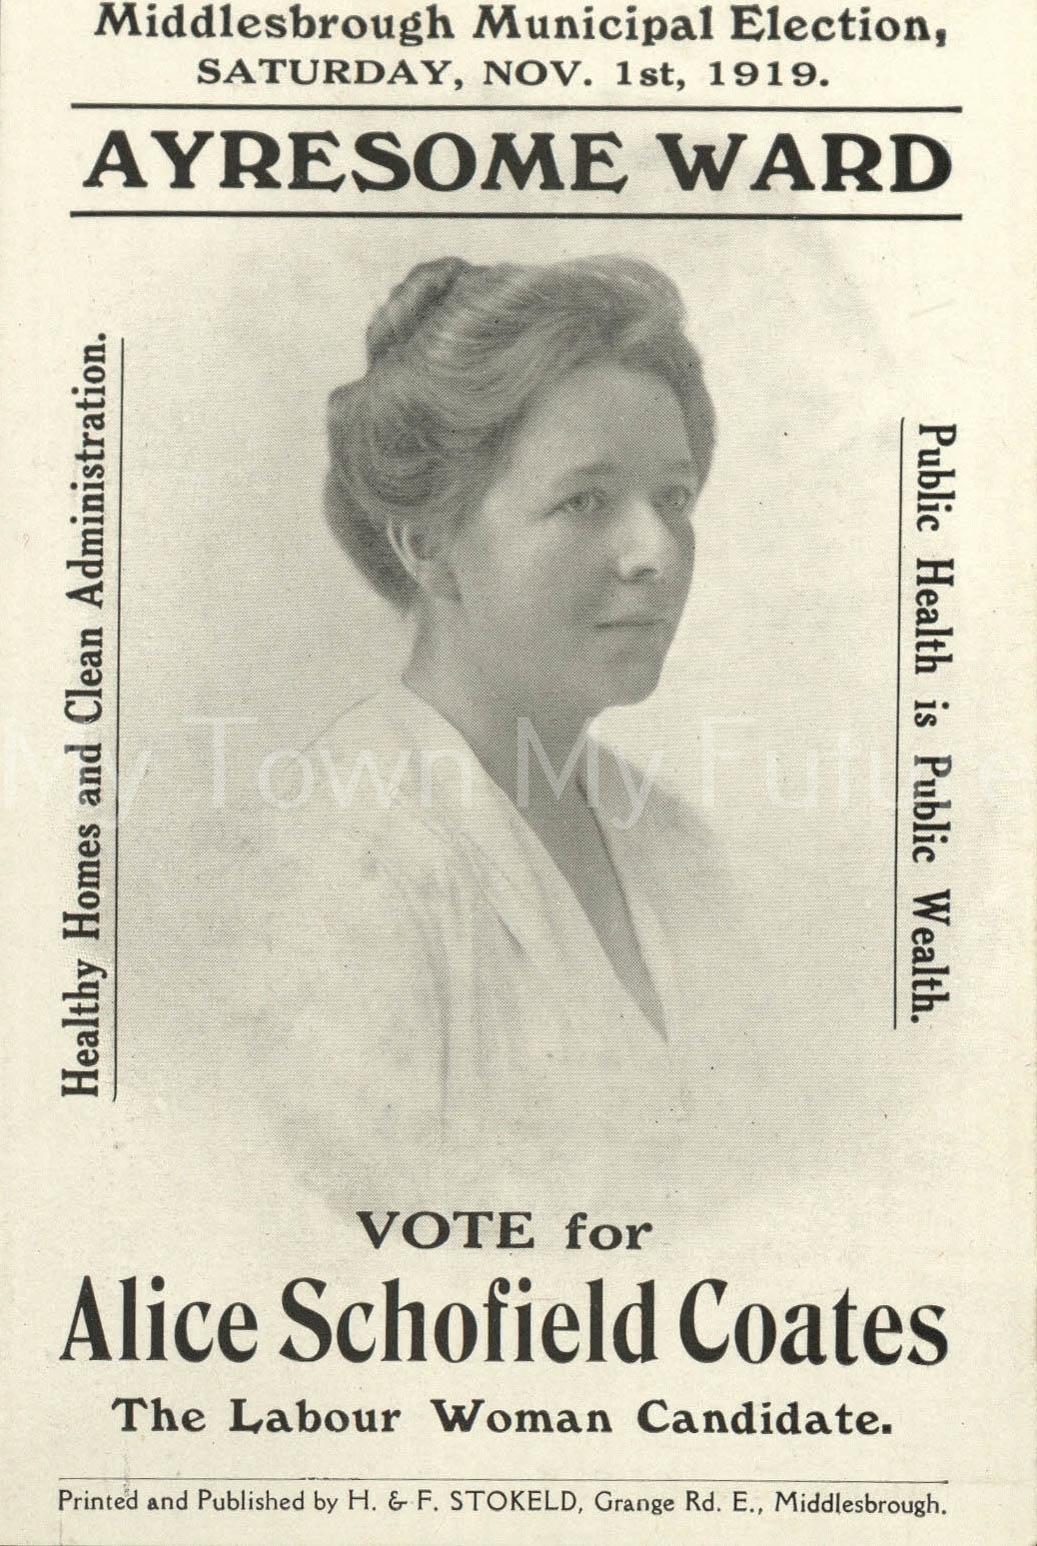 Alice Schofield Coates Election leaflet